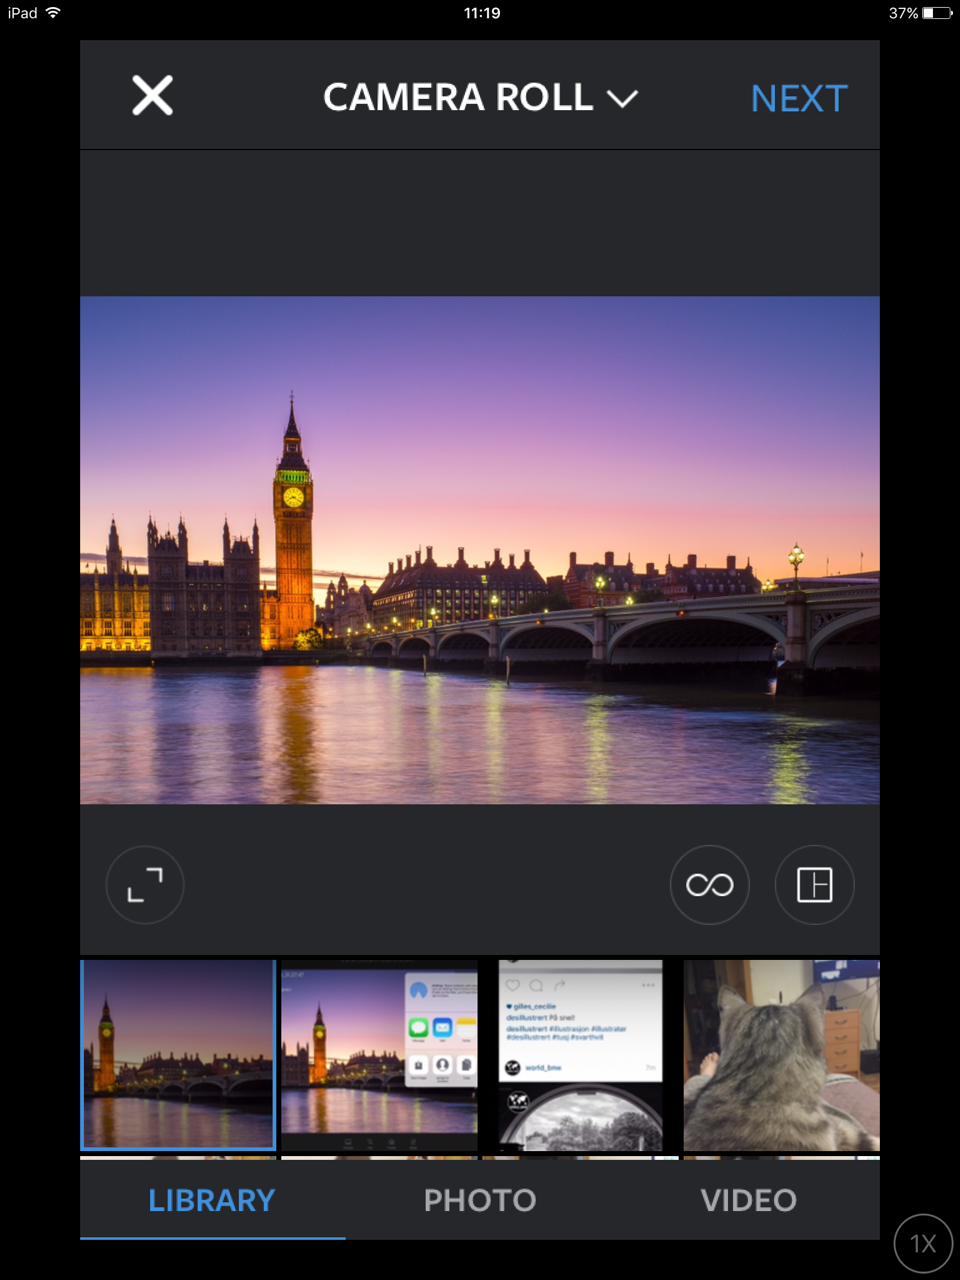 Returning the image back to landscape format in the Instagram app